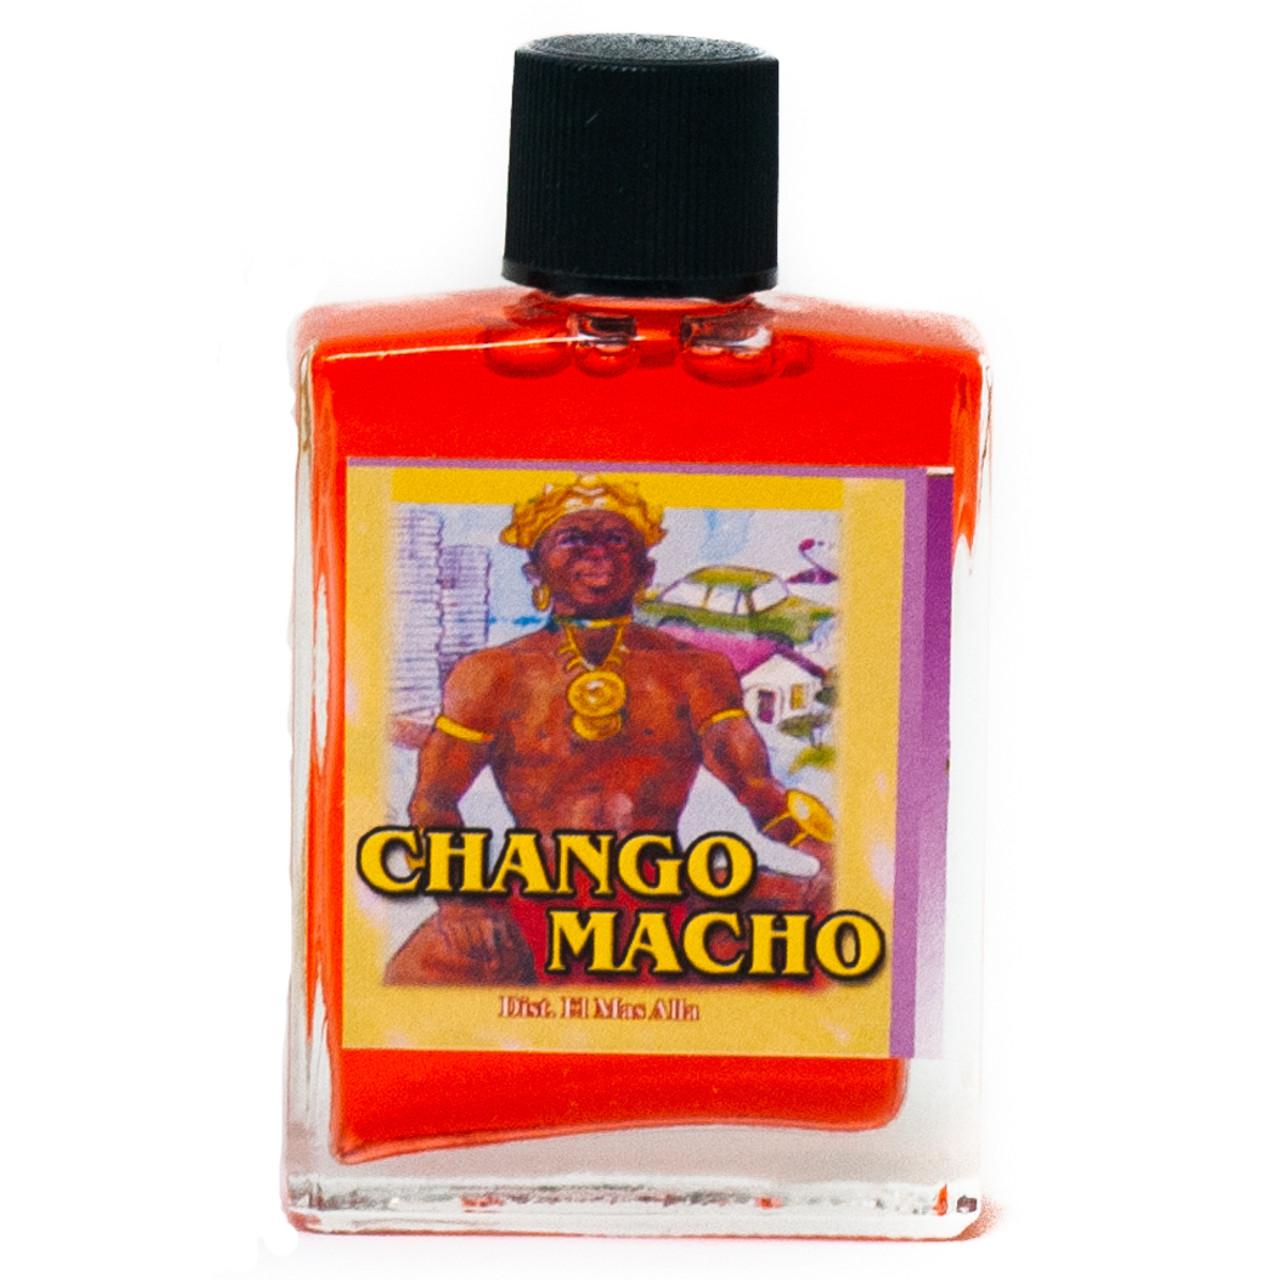 Perfume Chango Macho - Esoteric Perfume